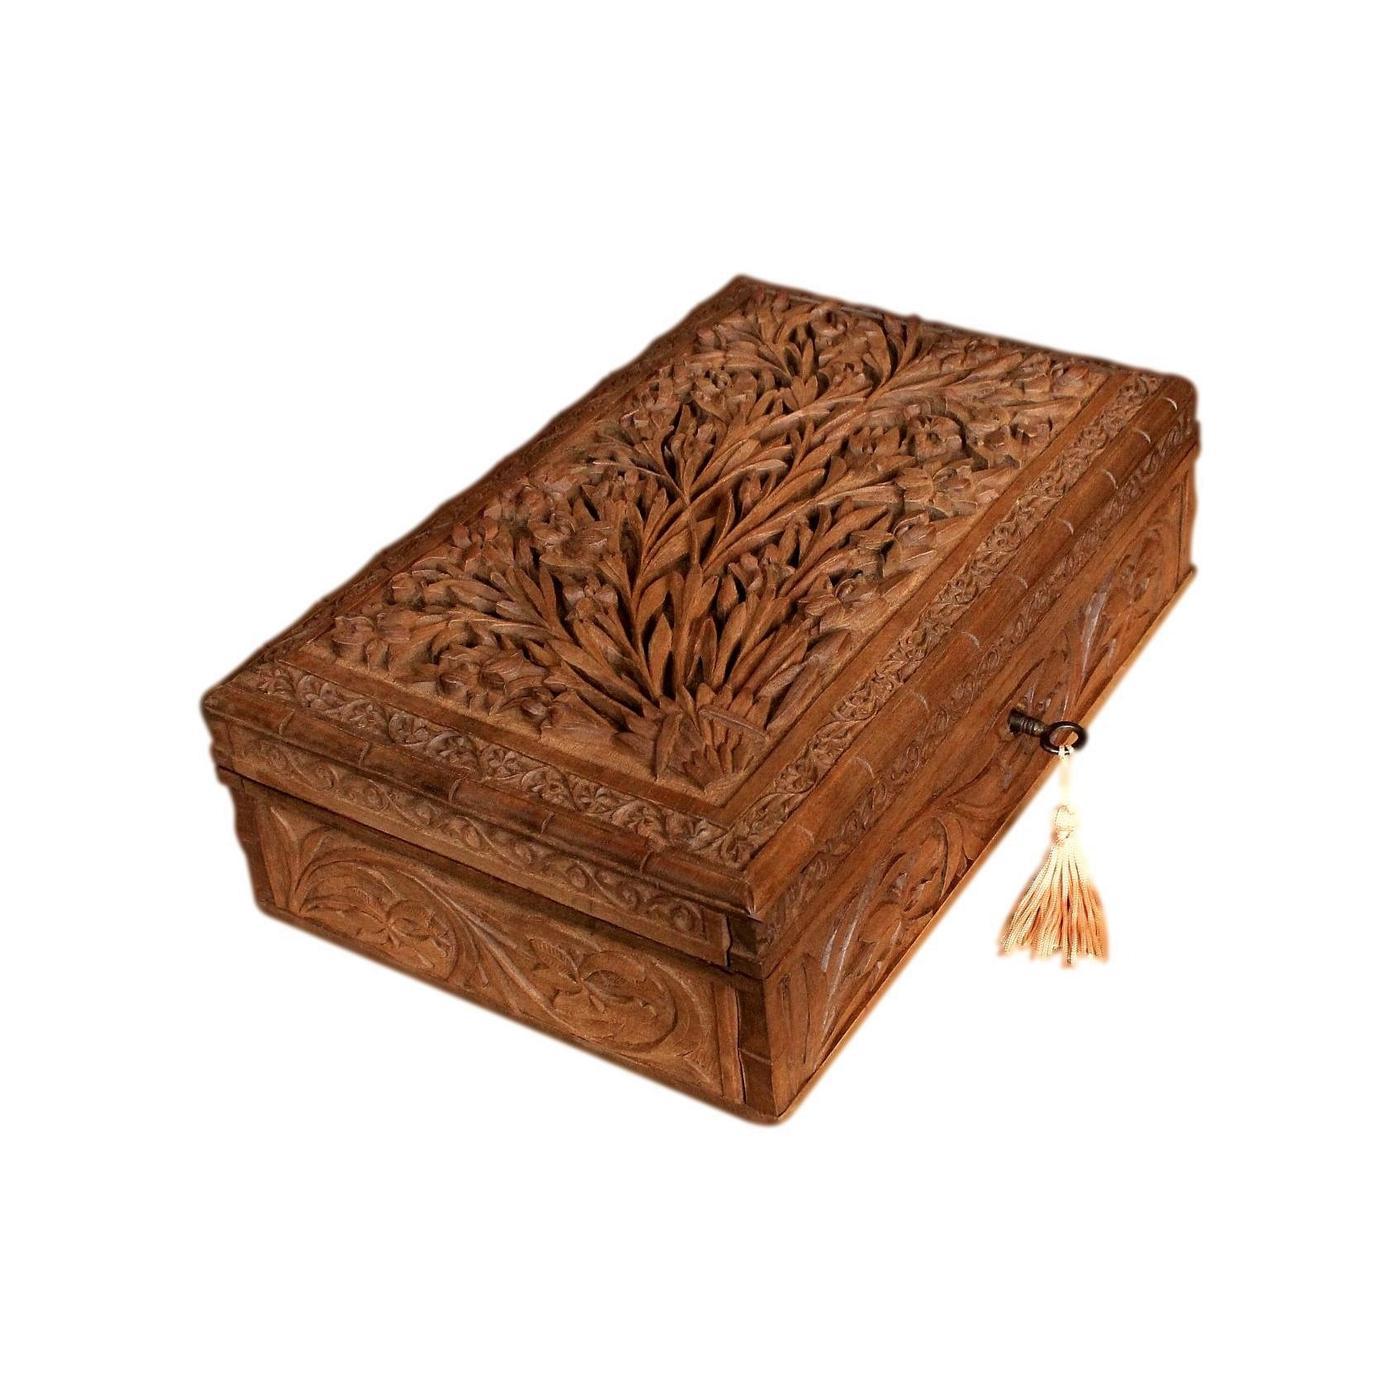 Vintage Mid 20th C Refurbished Kashmir Carved Walnut Jewellery Box